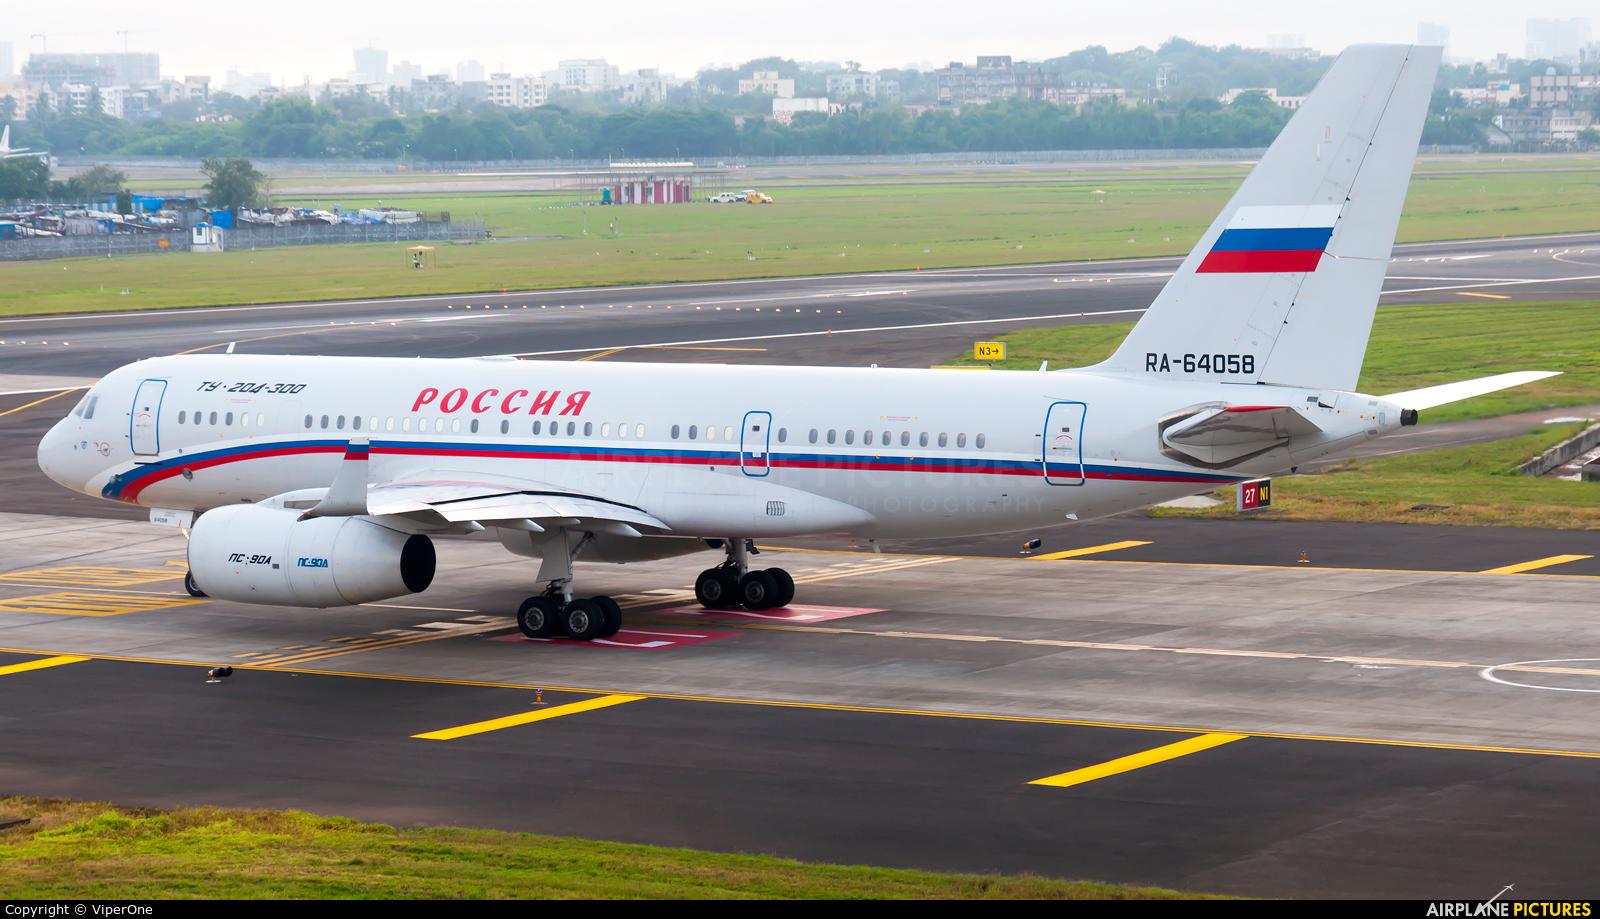 Rossiya RA-64058 aircraft at Mumbai - Chhatrapati Shivaji Intl